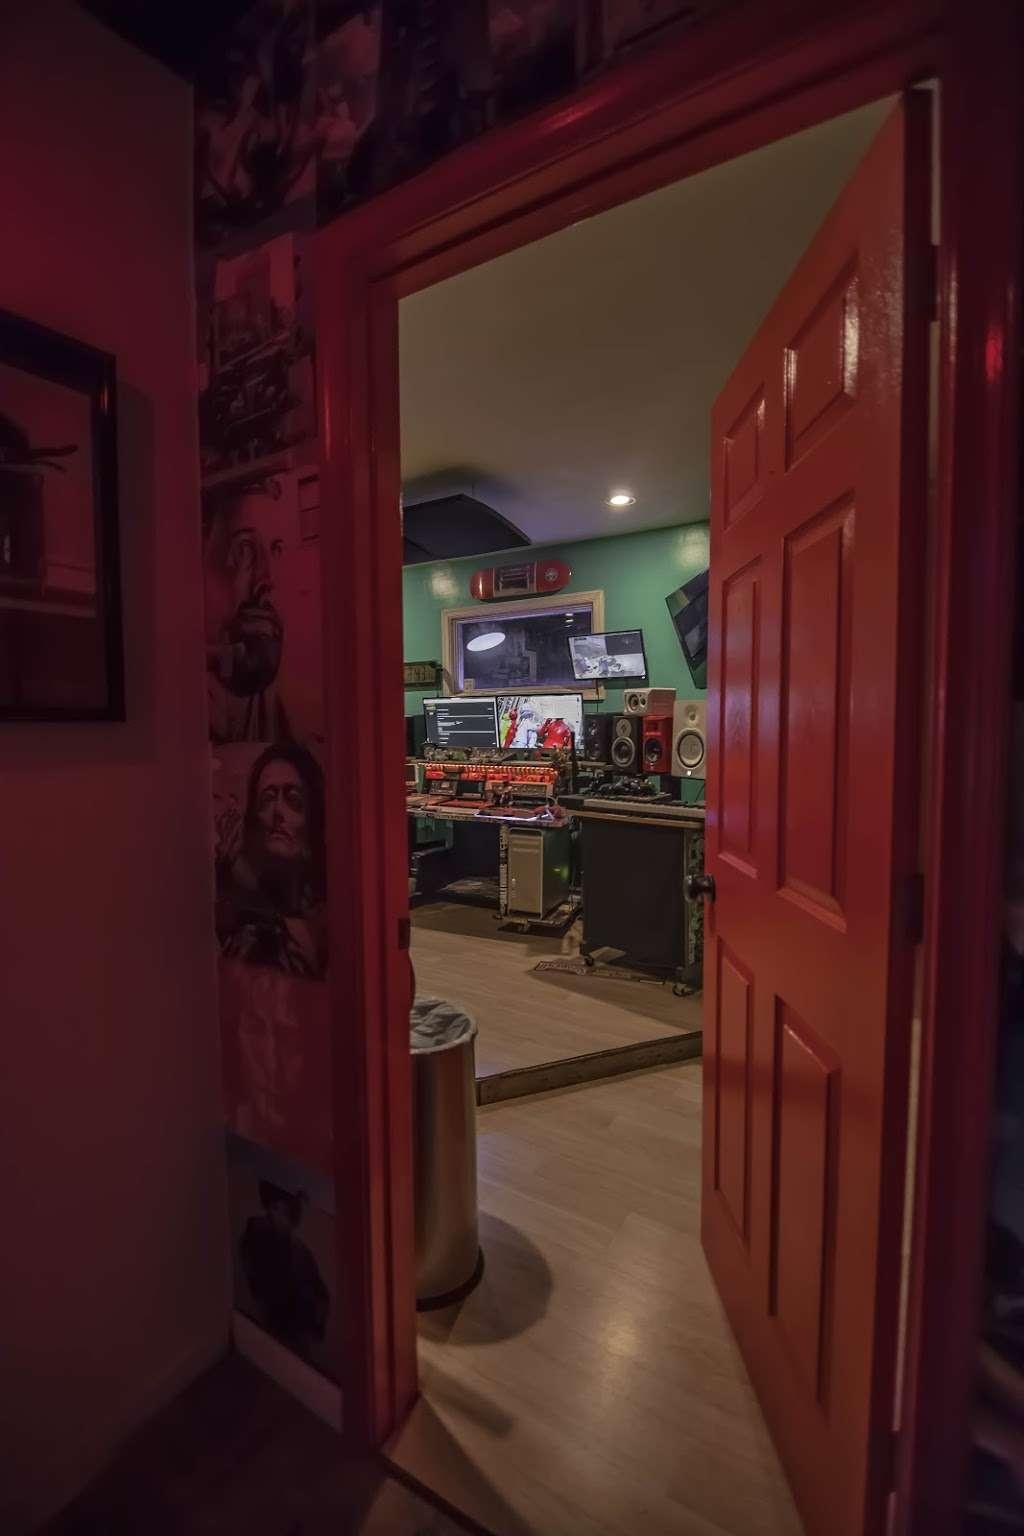 EBAN RECORDING | FILM STUDIOS - electronics store  | Photo 8 of 10 | Address: 934 W Patapsco Ave, Baltimore, MD 21230, USA | Phone: (443) 430-1764